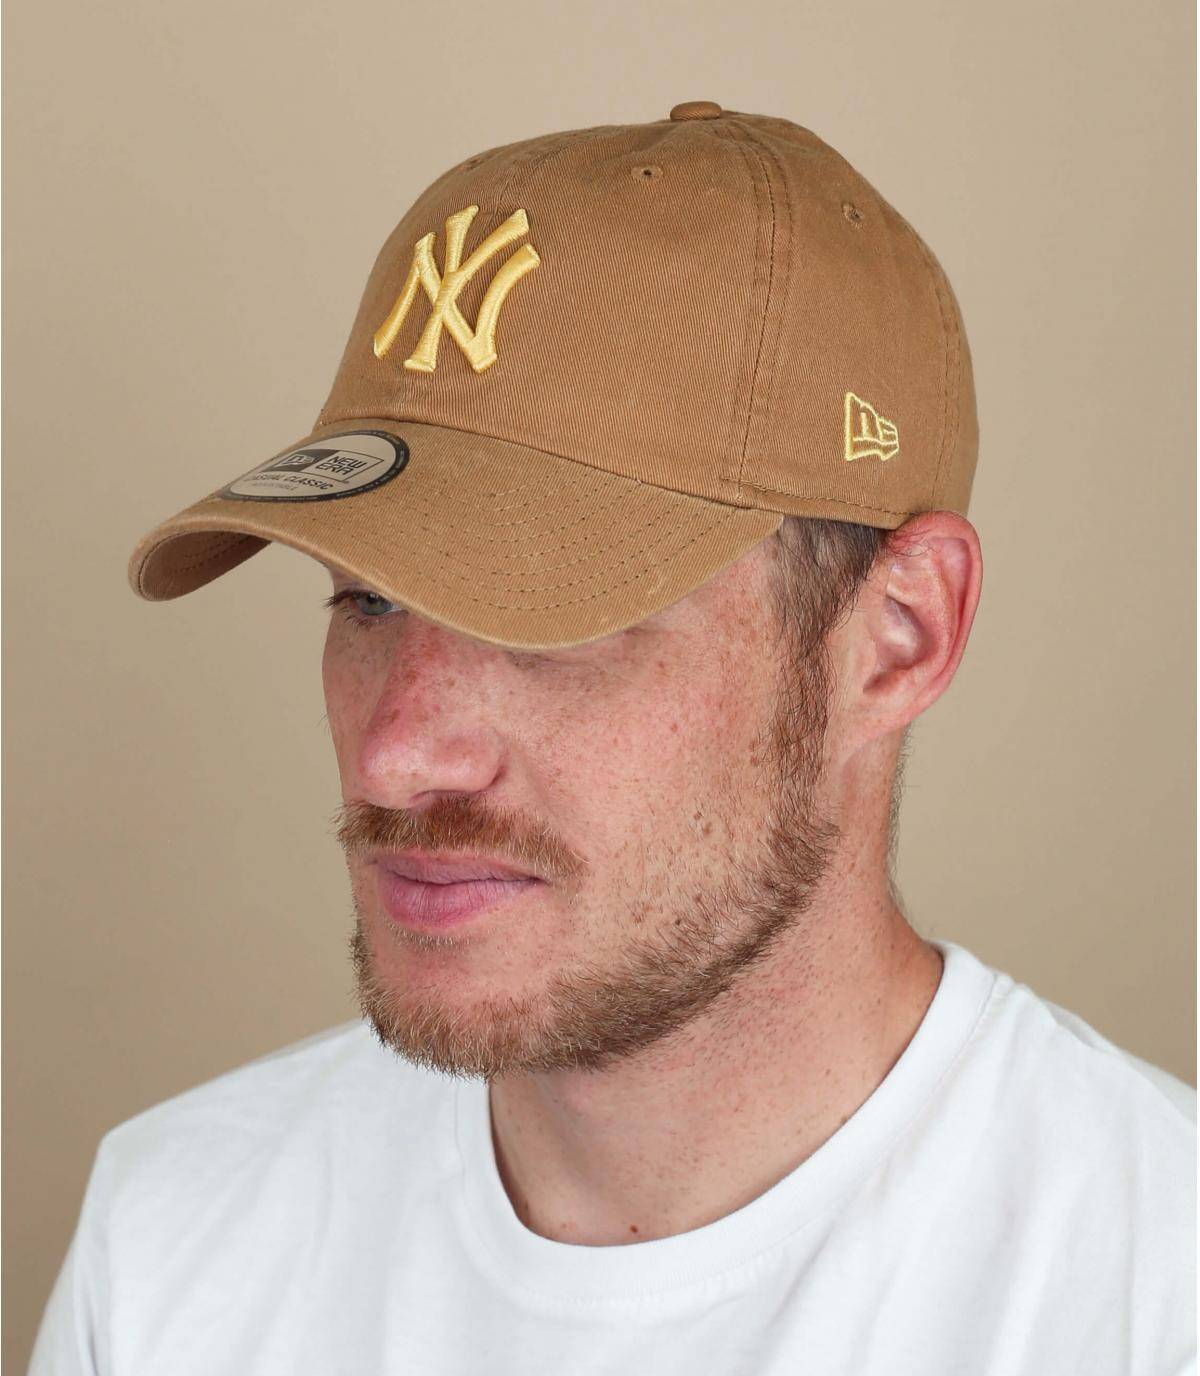 gorra NY beige